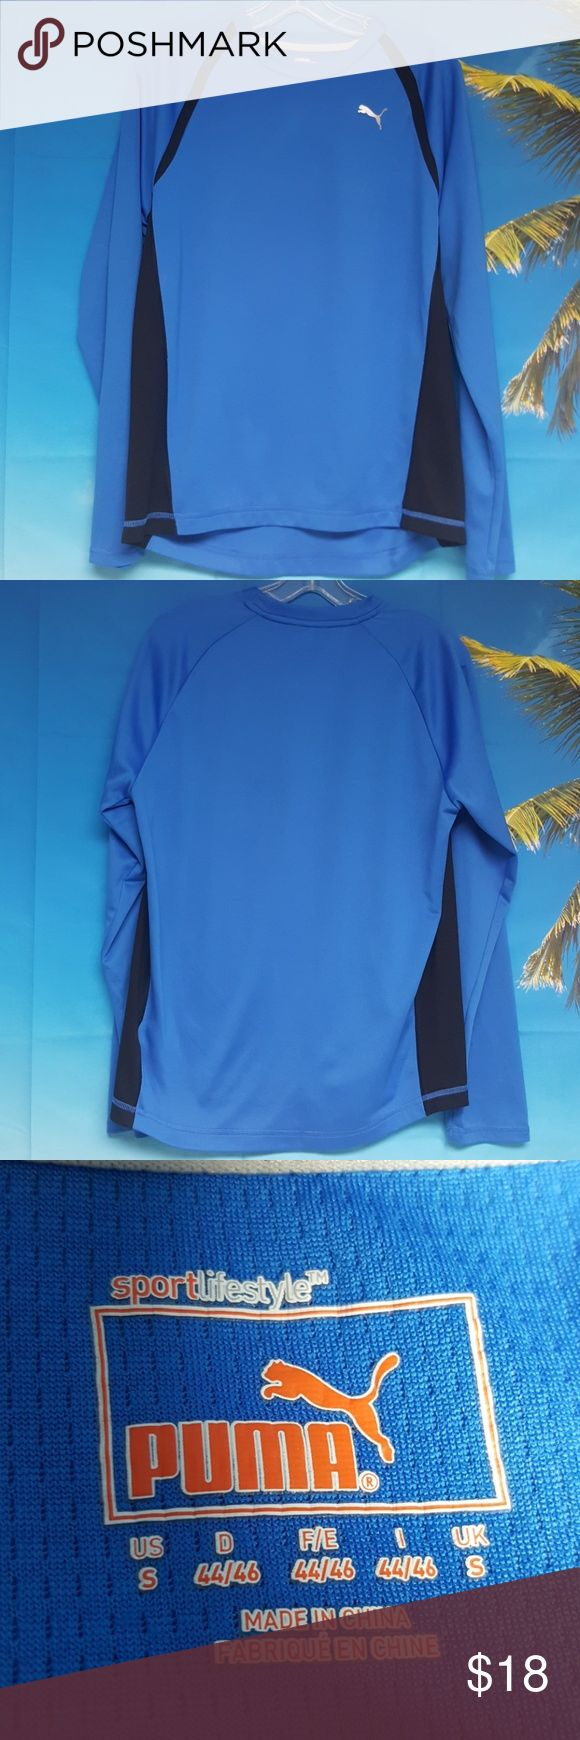 PUMA SHIRT 100% polyester Puma Shirts